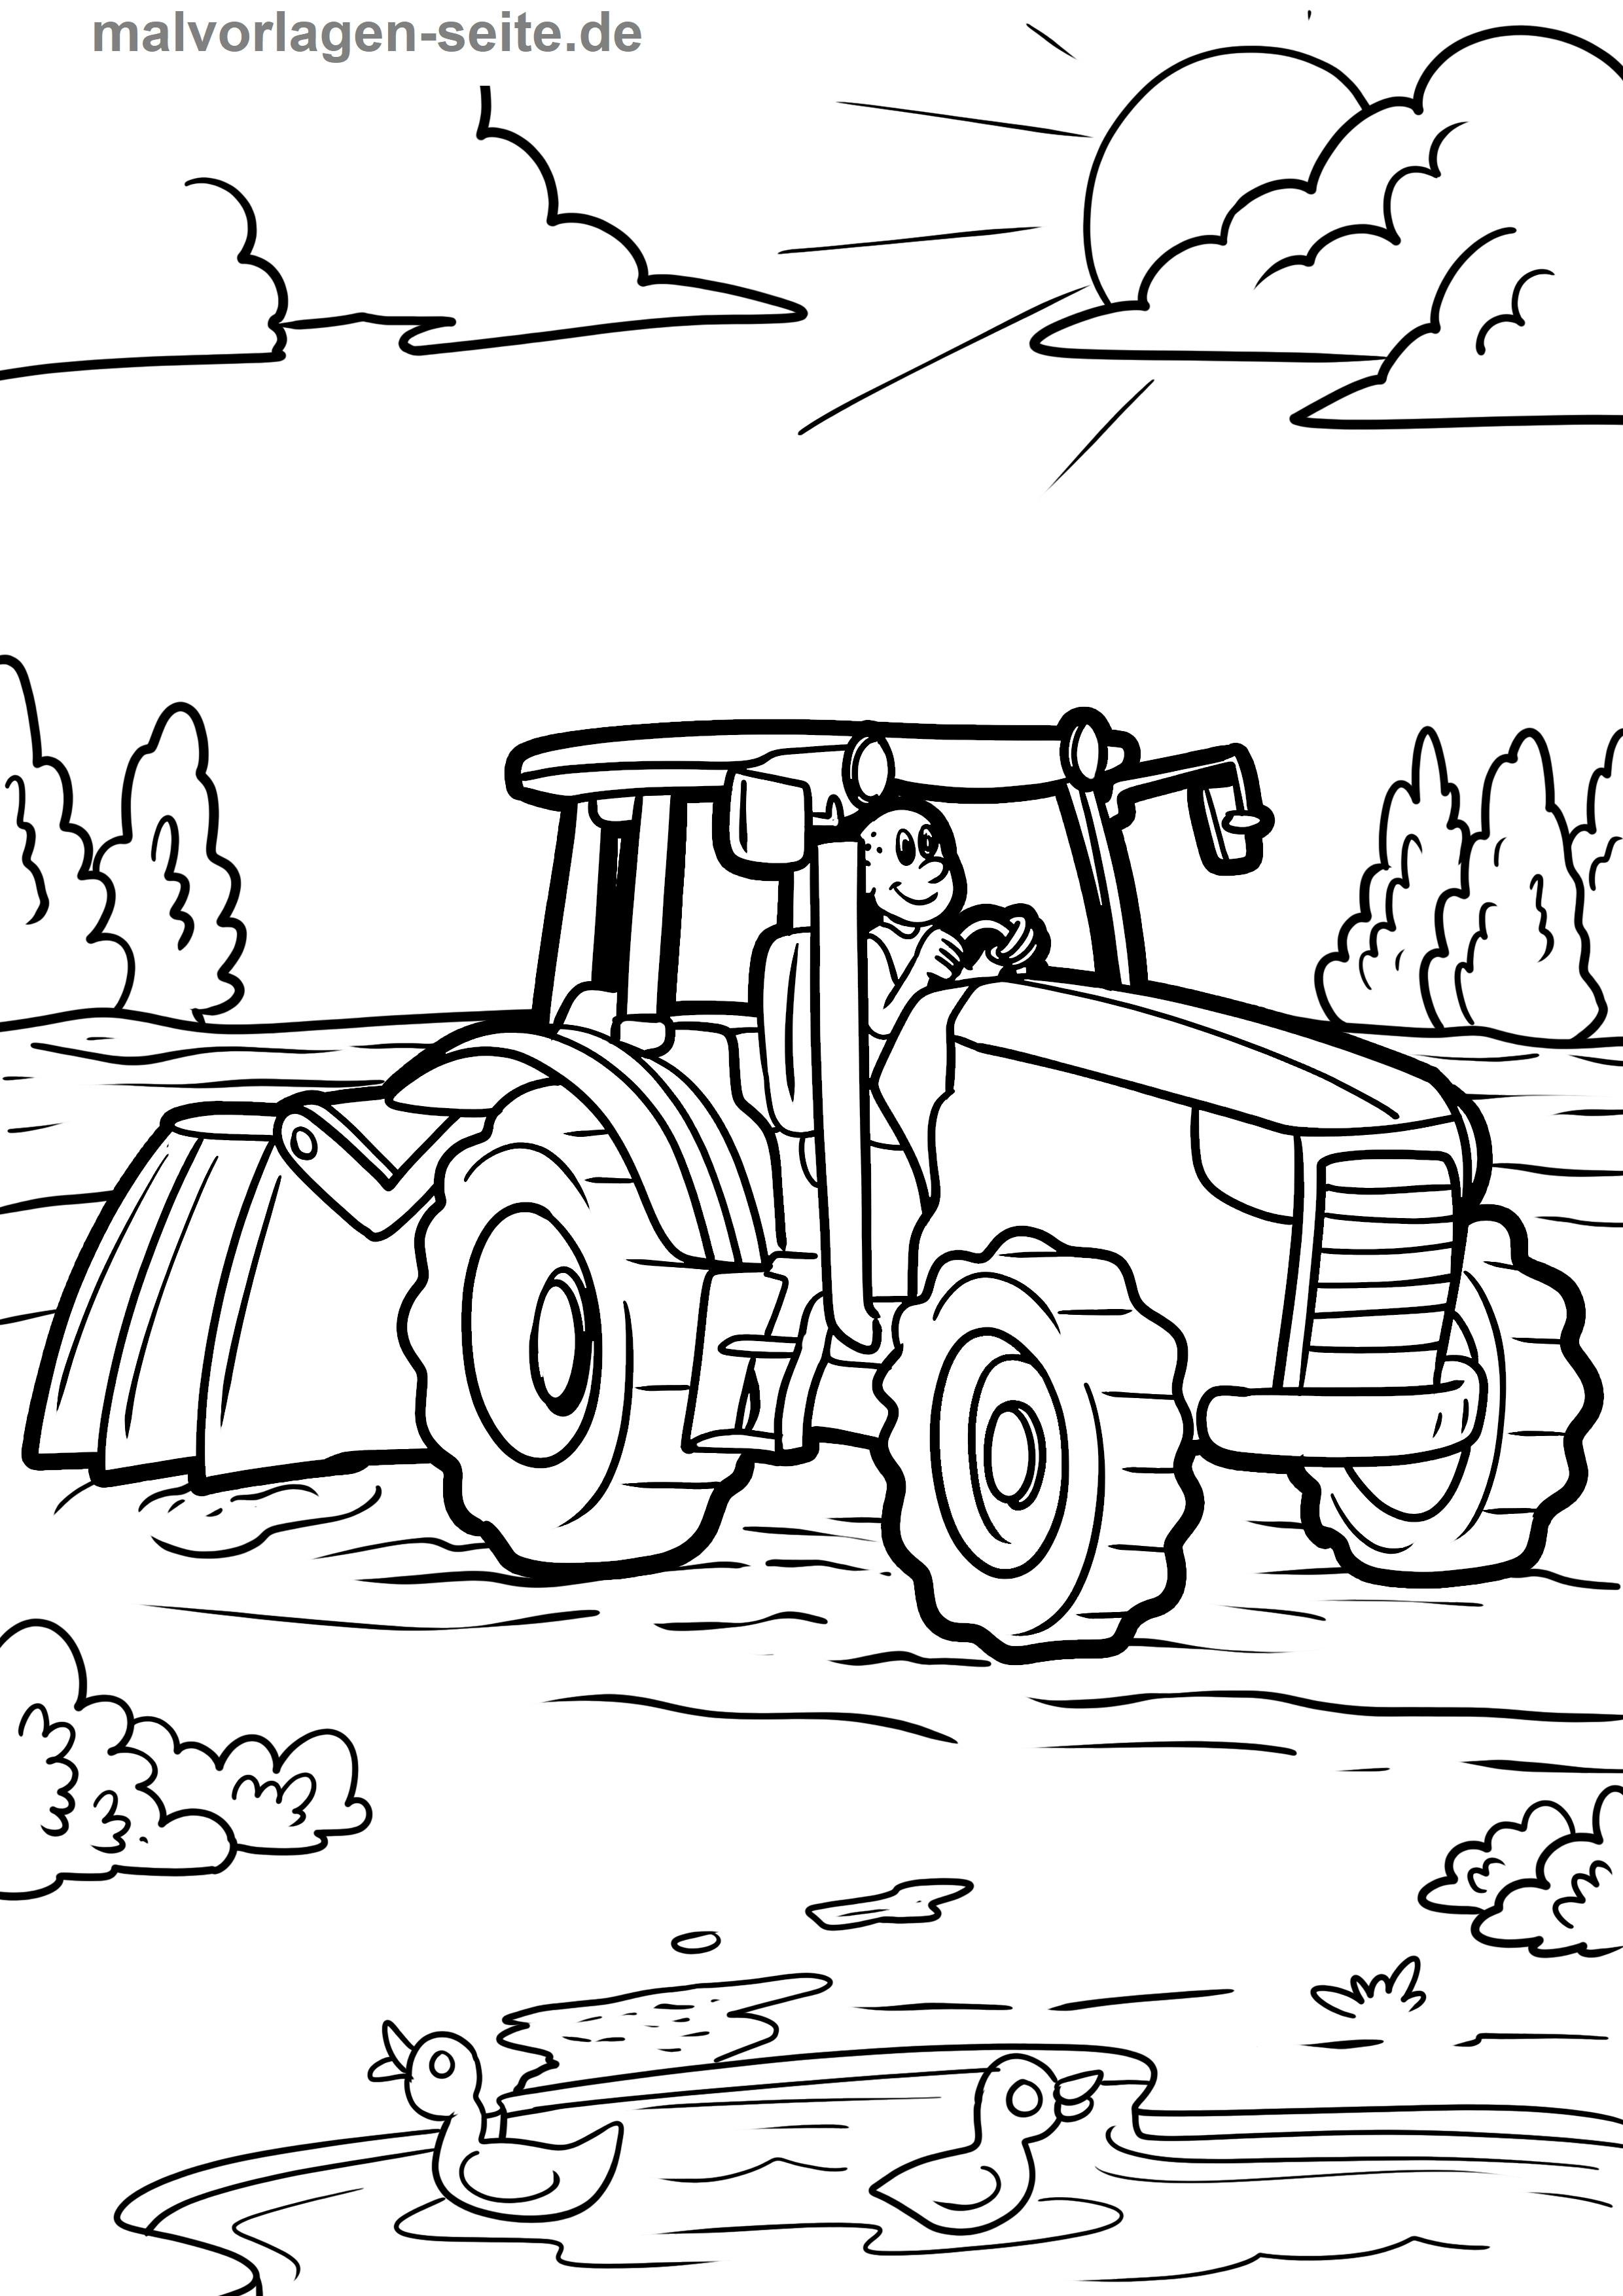 Ausmalbilder Traktor Mit Pflug Neu Malvorlage Bauernhof Feld Pflug Fotografieren